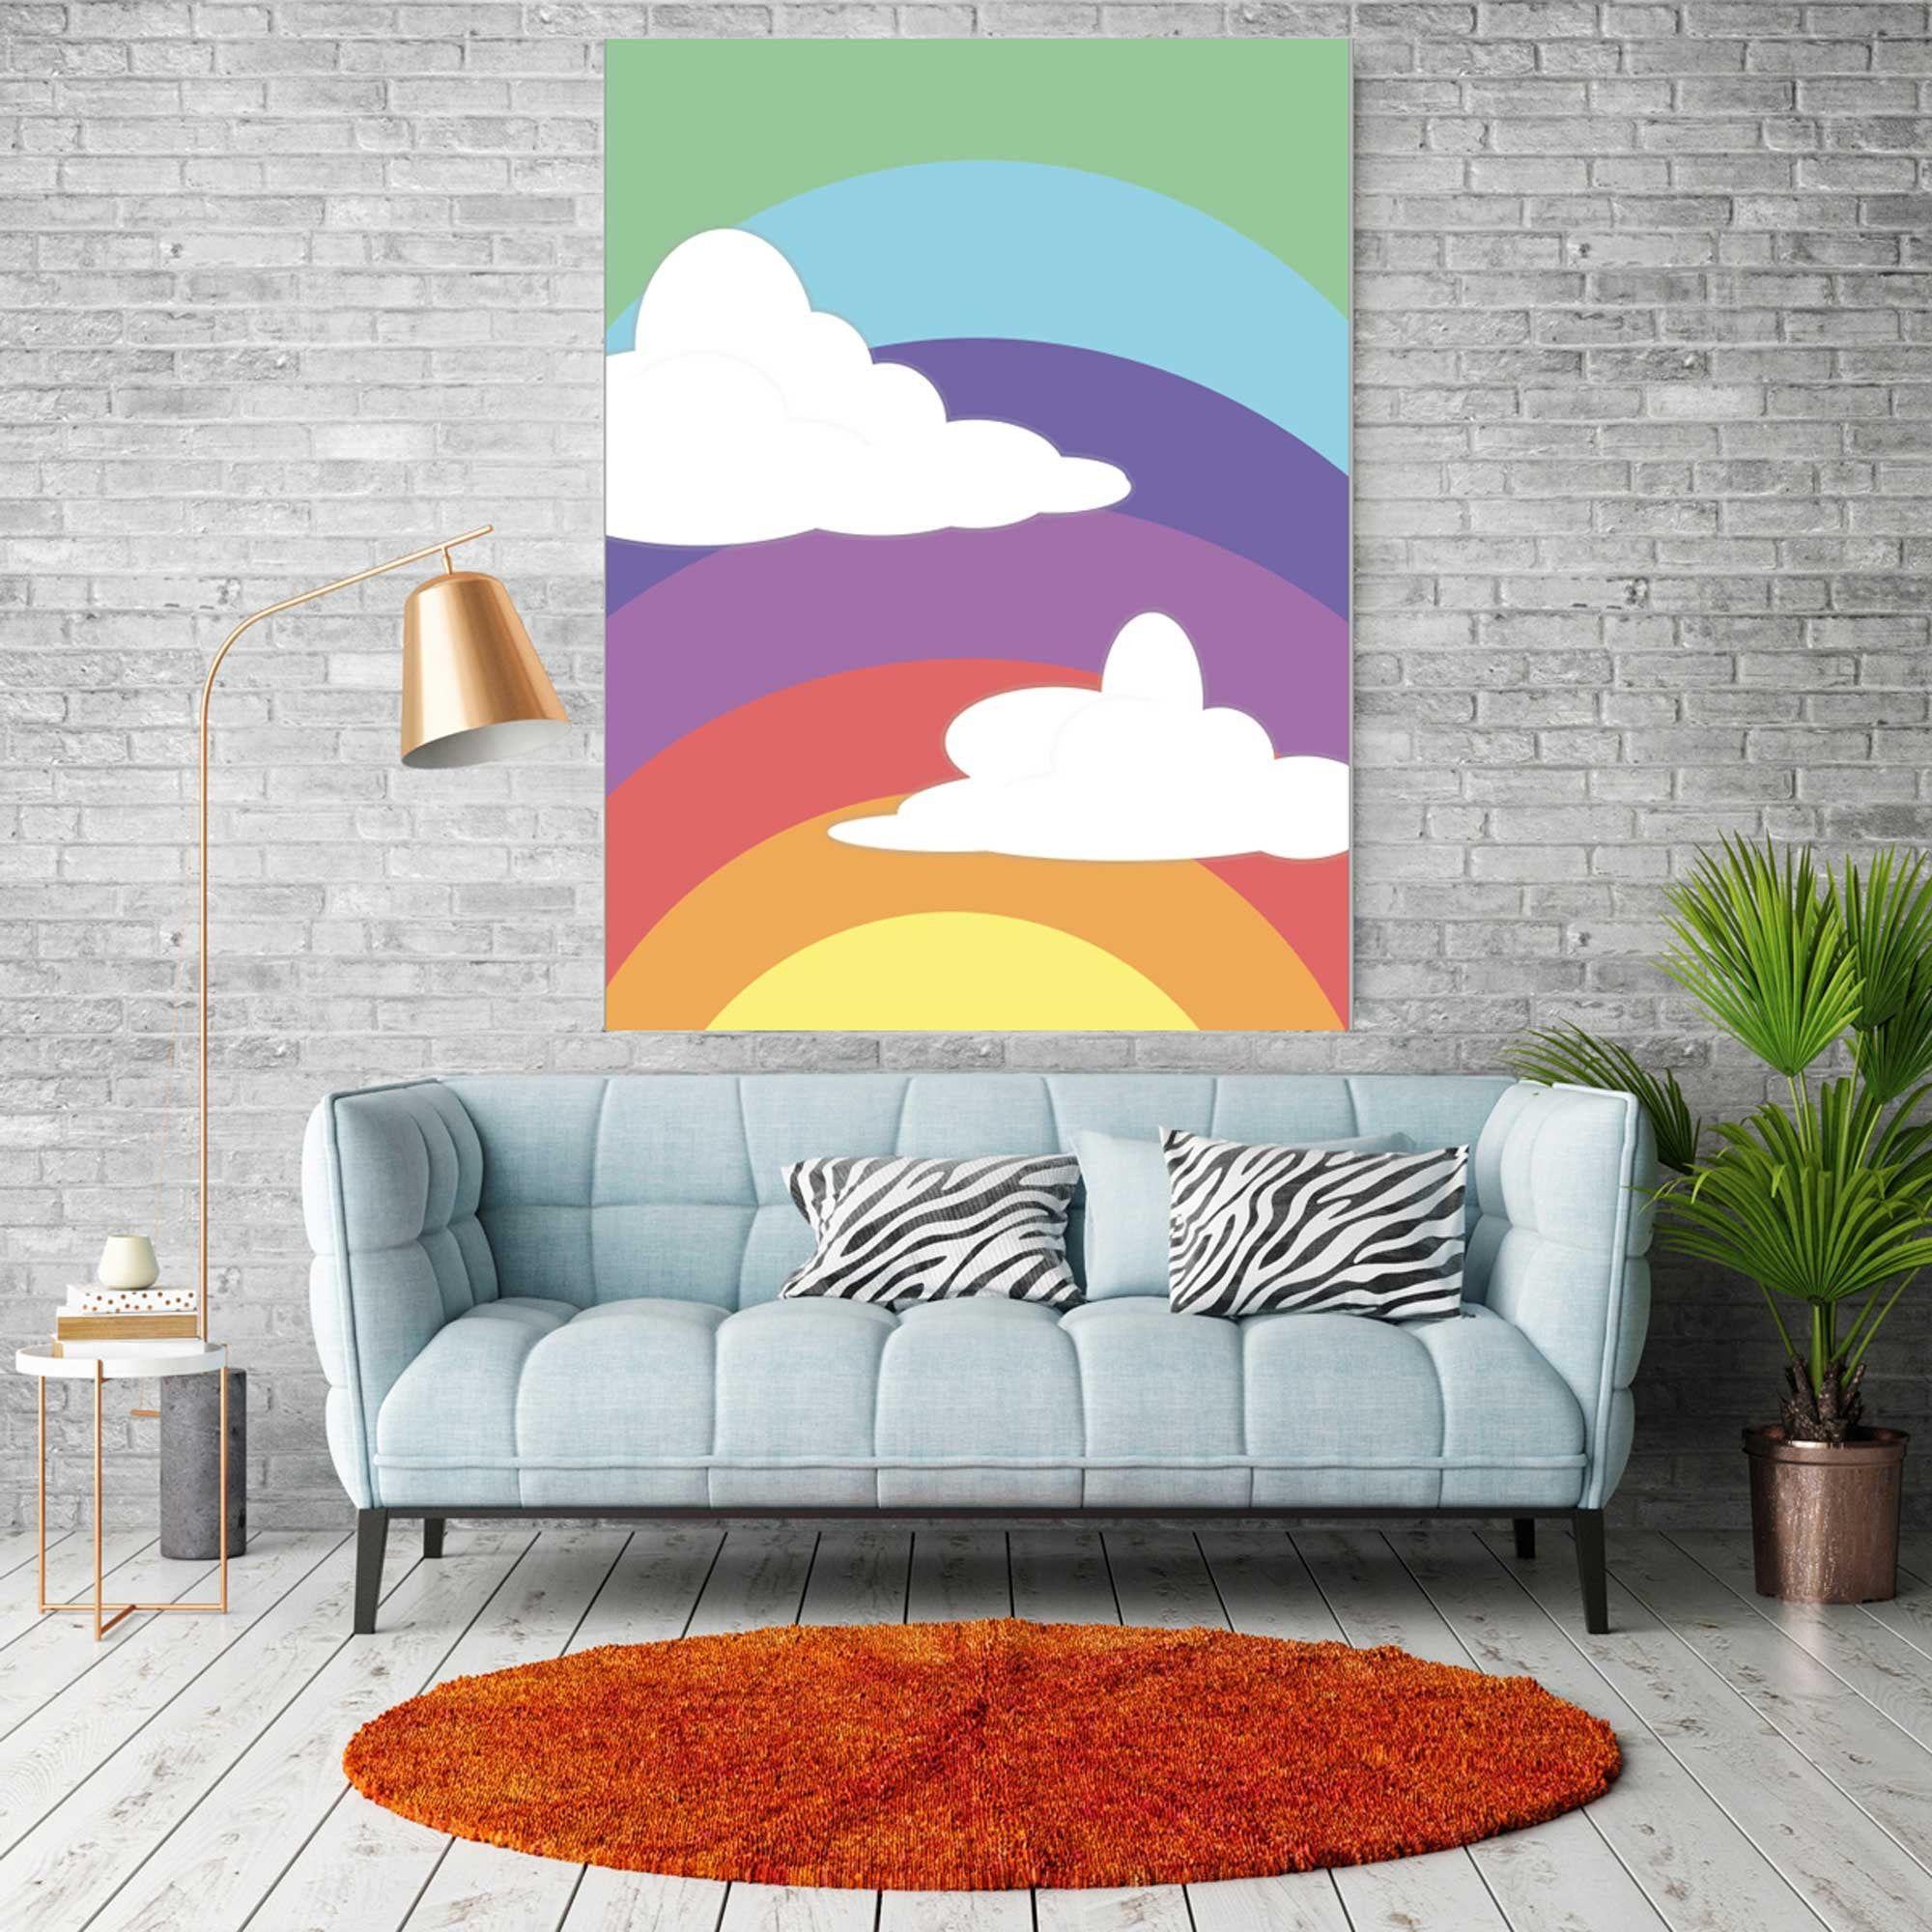 Rainbow Print Princess Print Bob S Burger Wall Poster Etsy In 2021 Rainbow Print Inspirational Posters Poster Wall